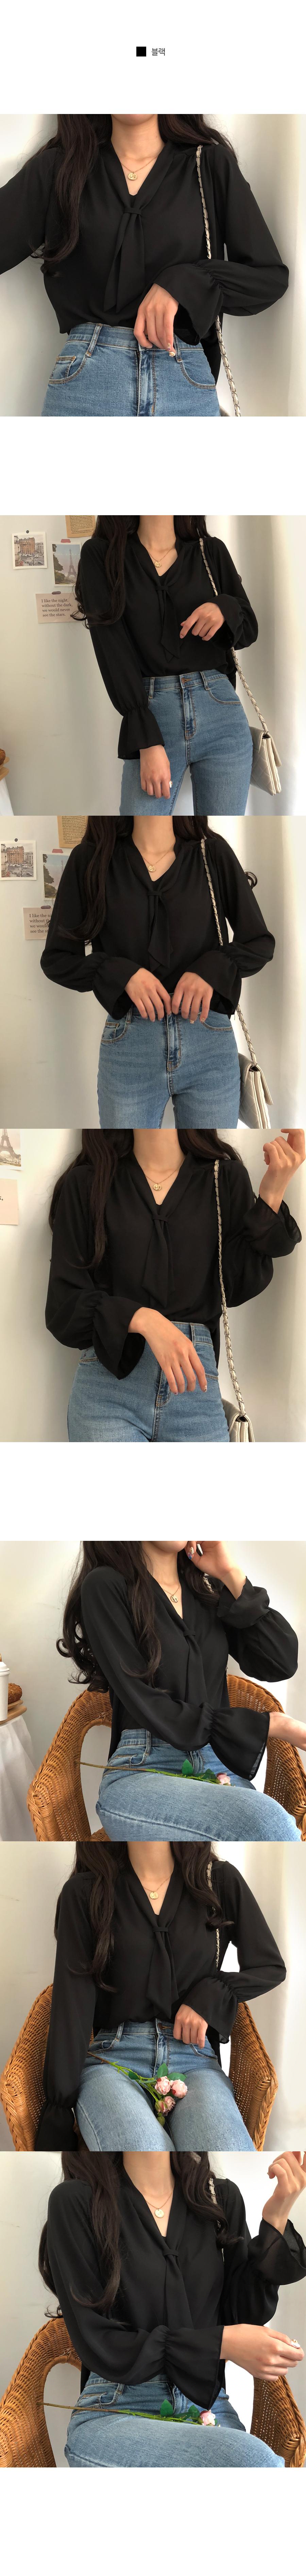 Xavier scarf blouse